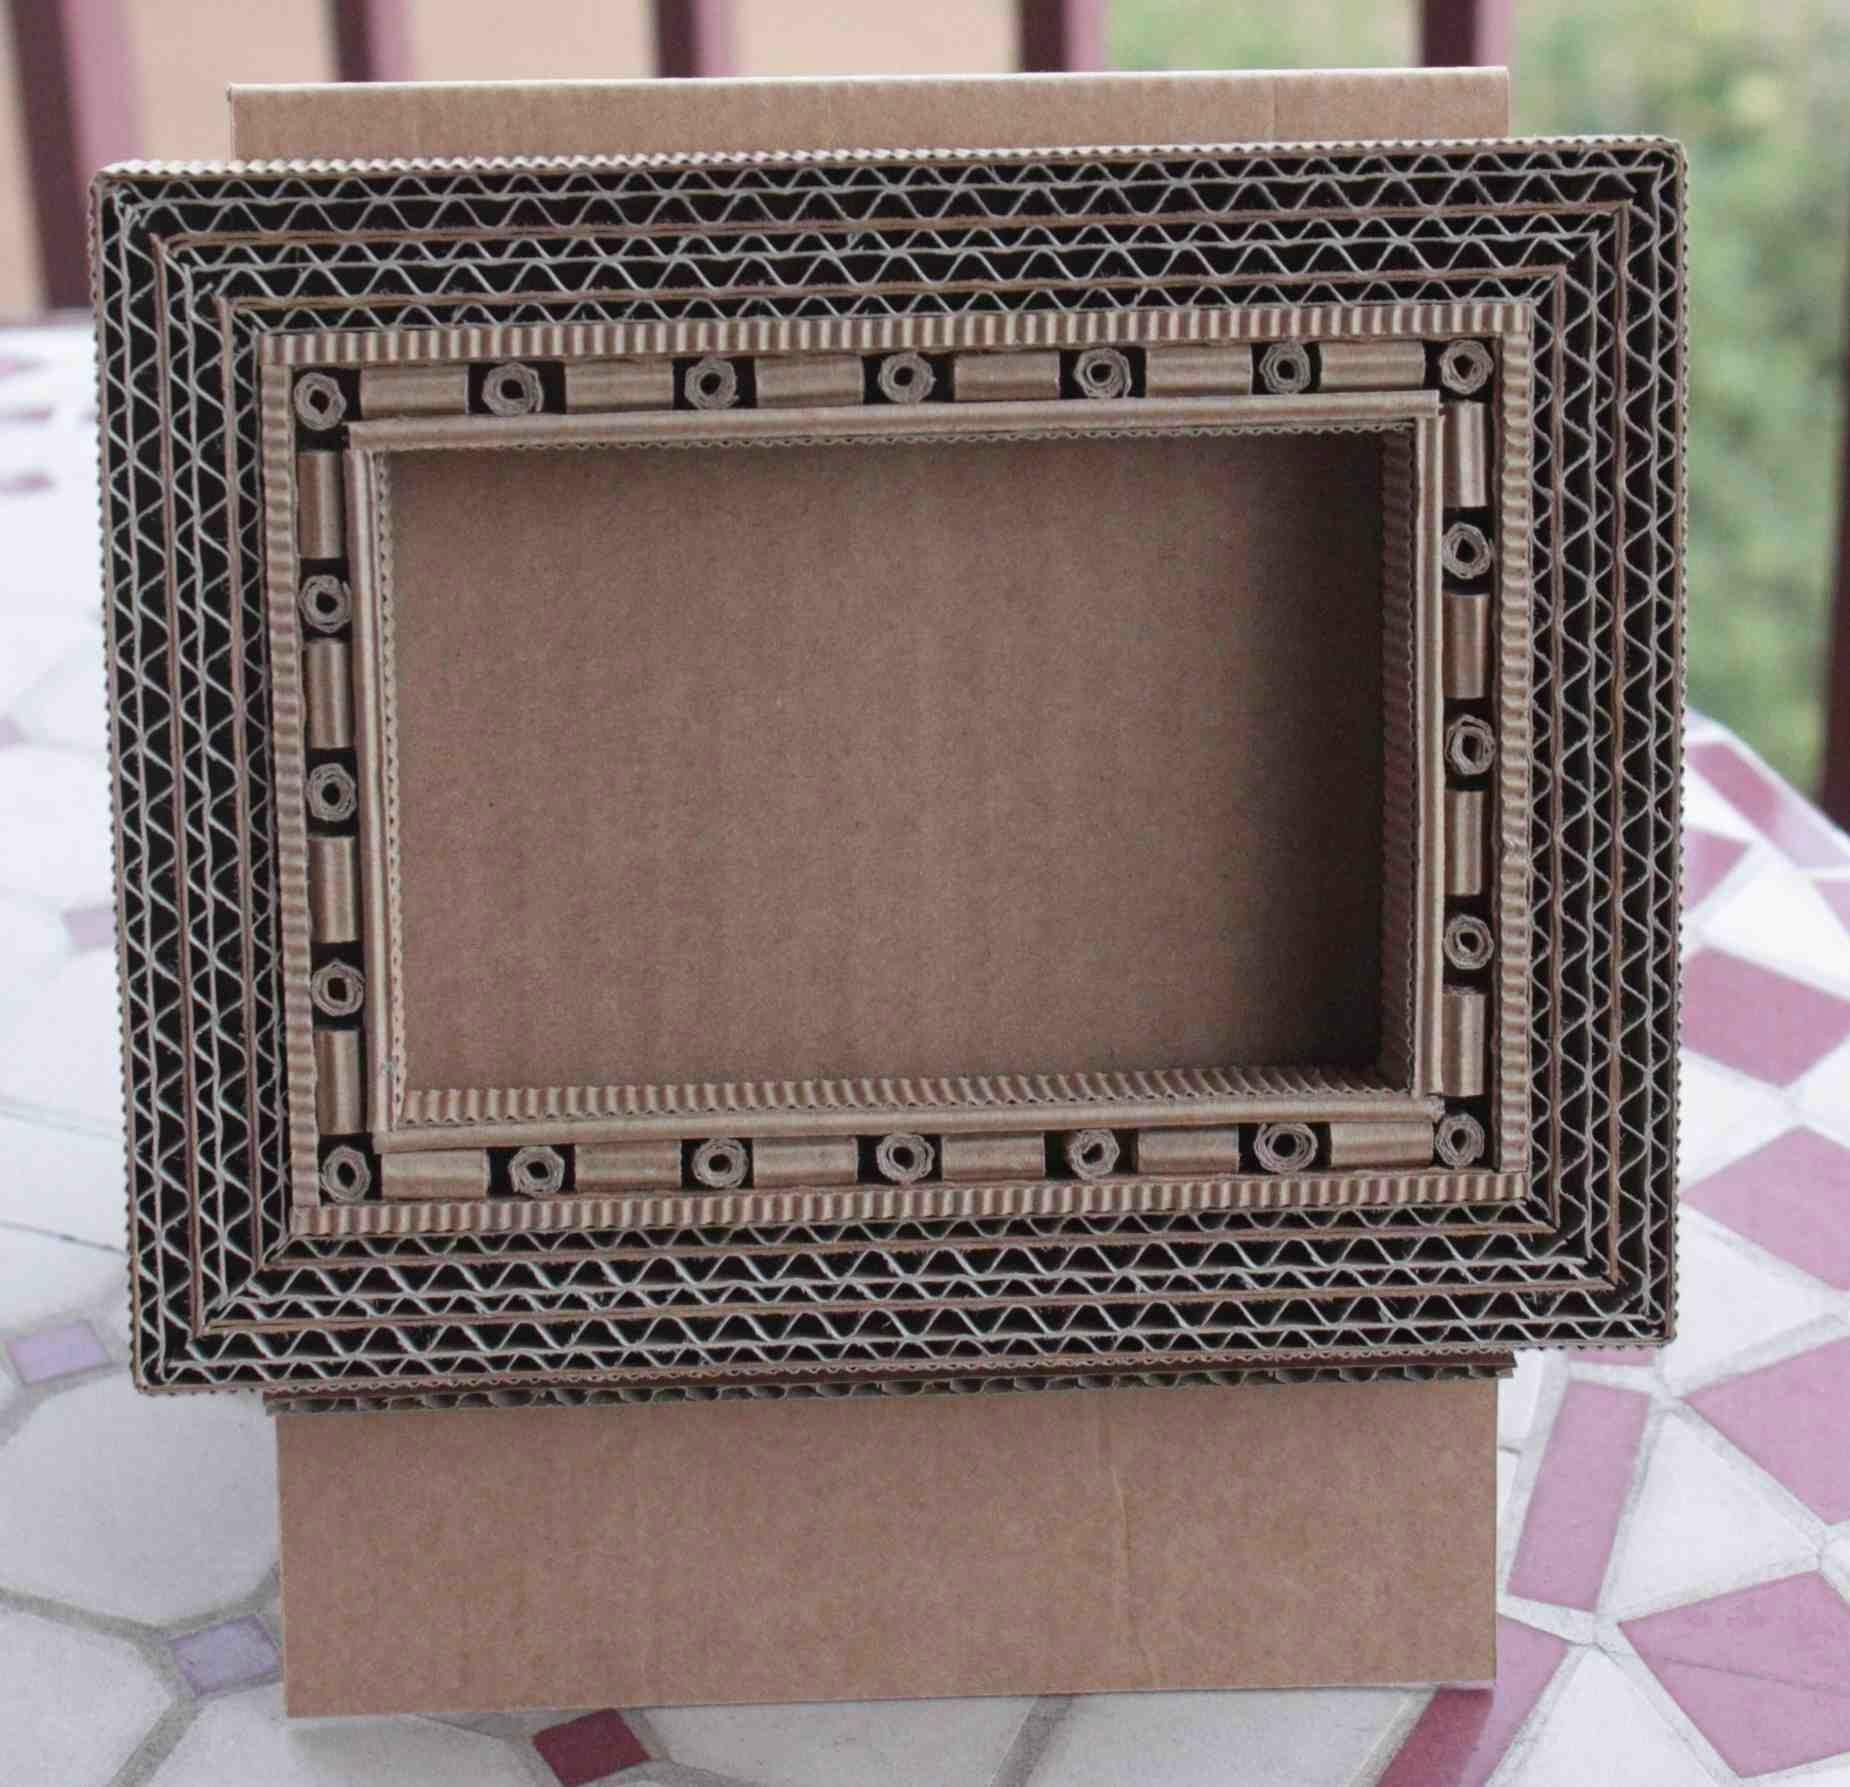 Connu Cadre en carton | Frames & Cadres | Pinterest | Cadre en carton  IB86